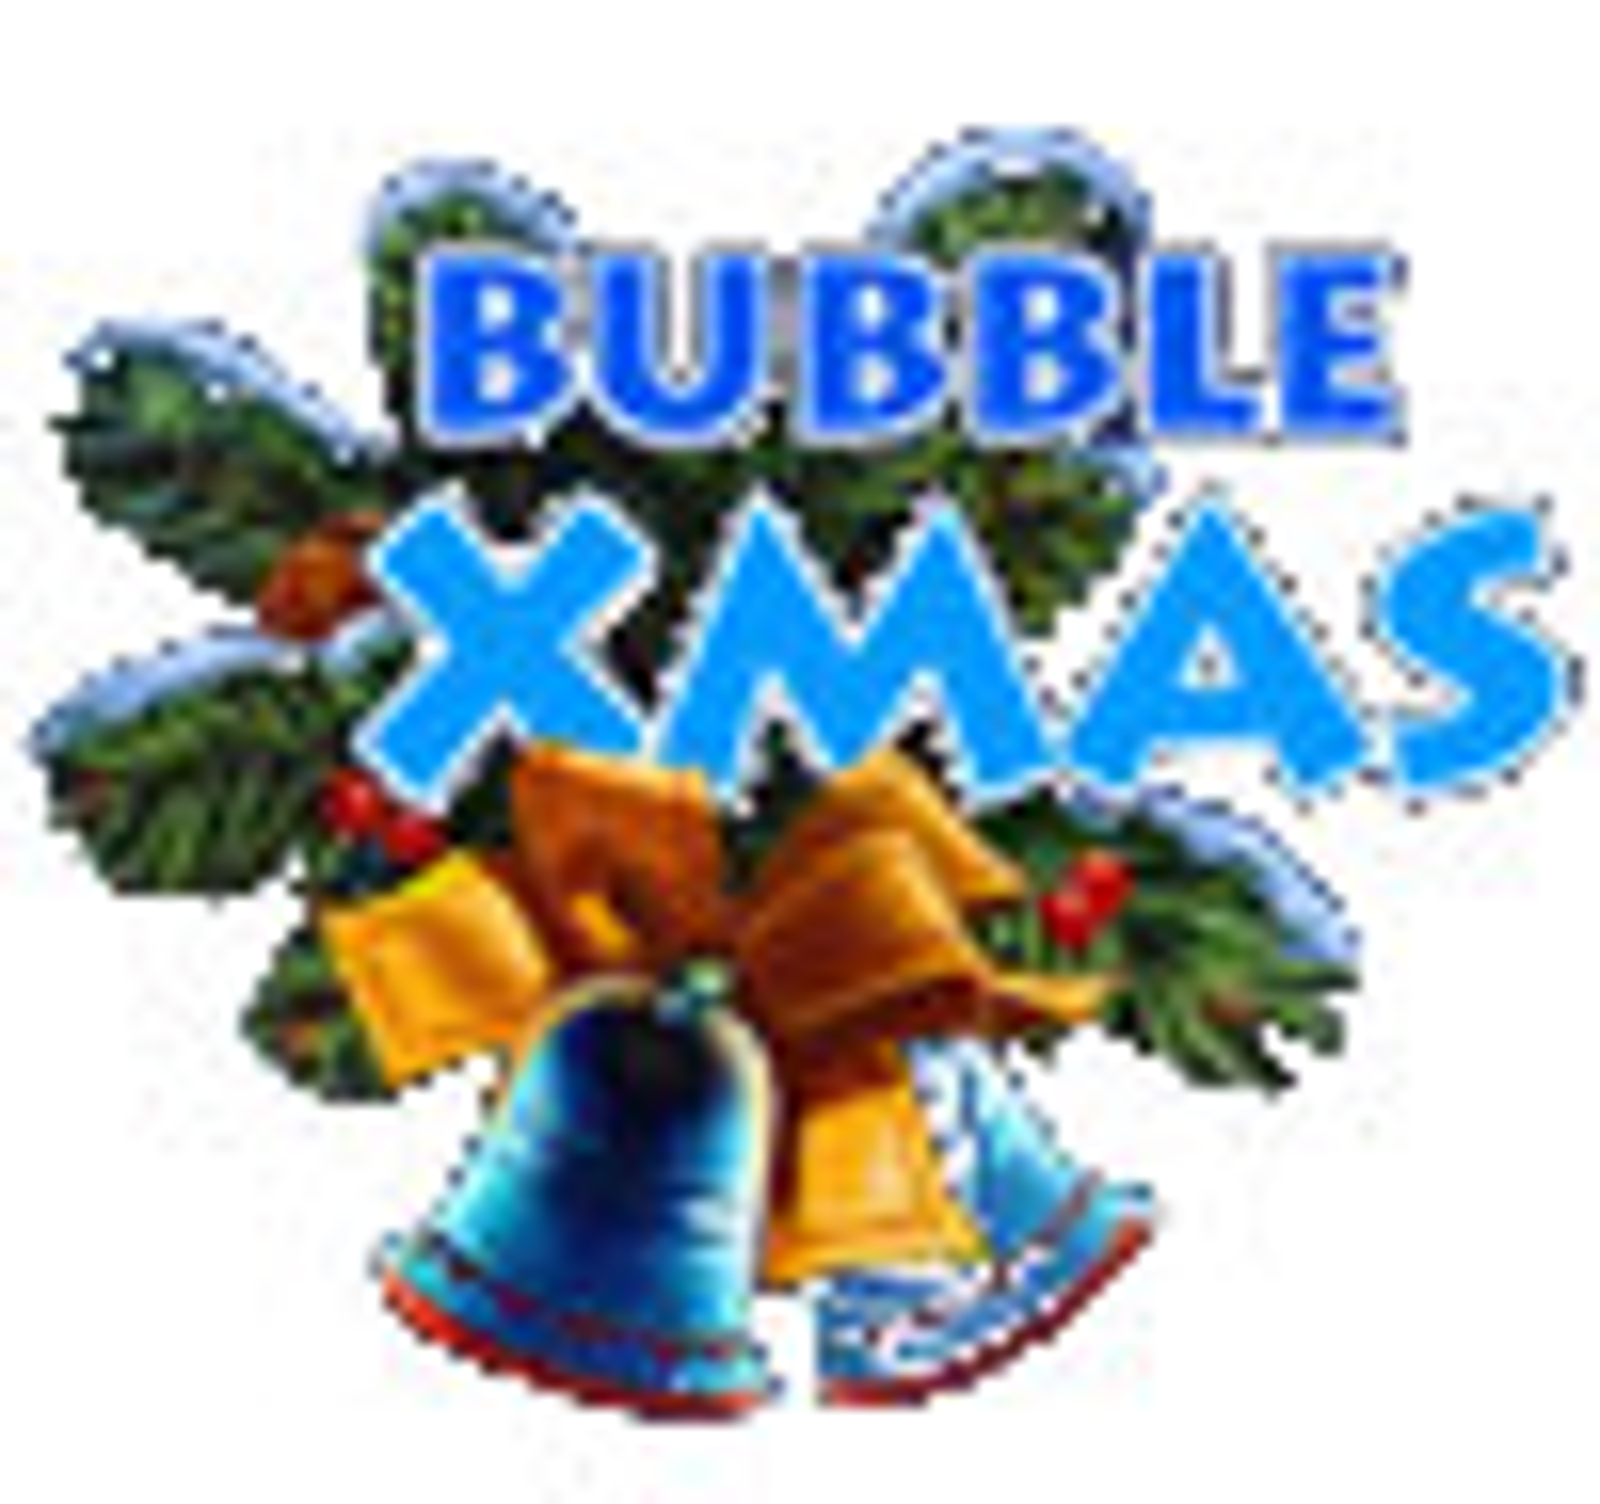 Bubbles Xmas